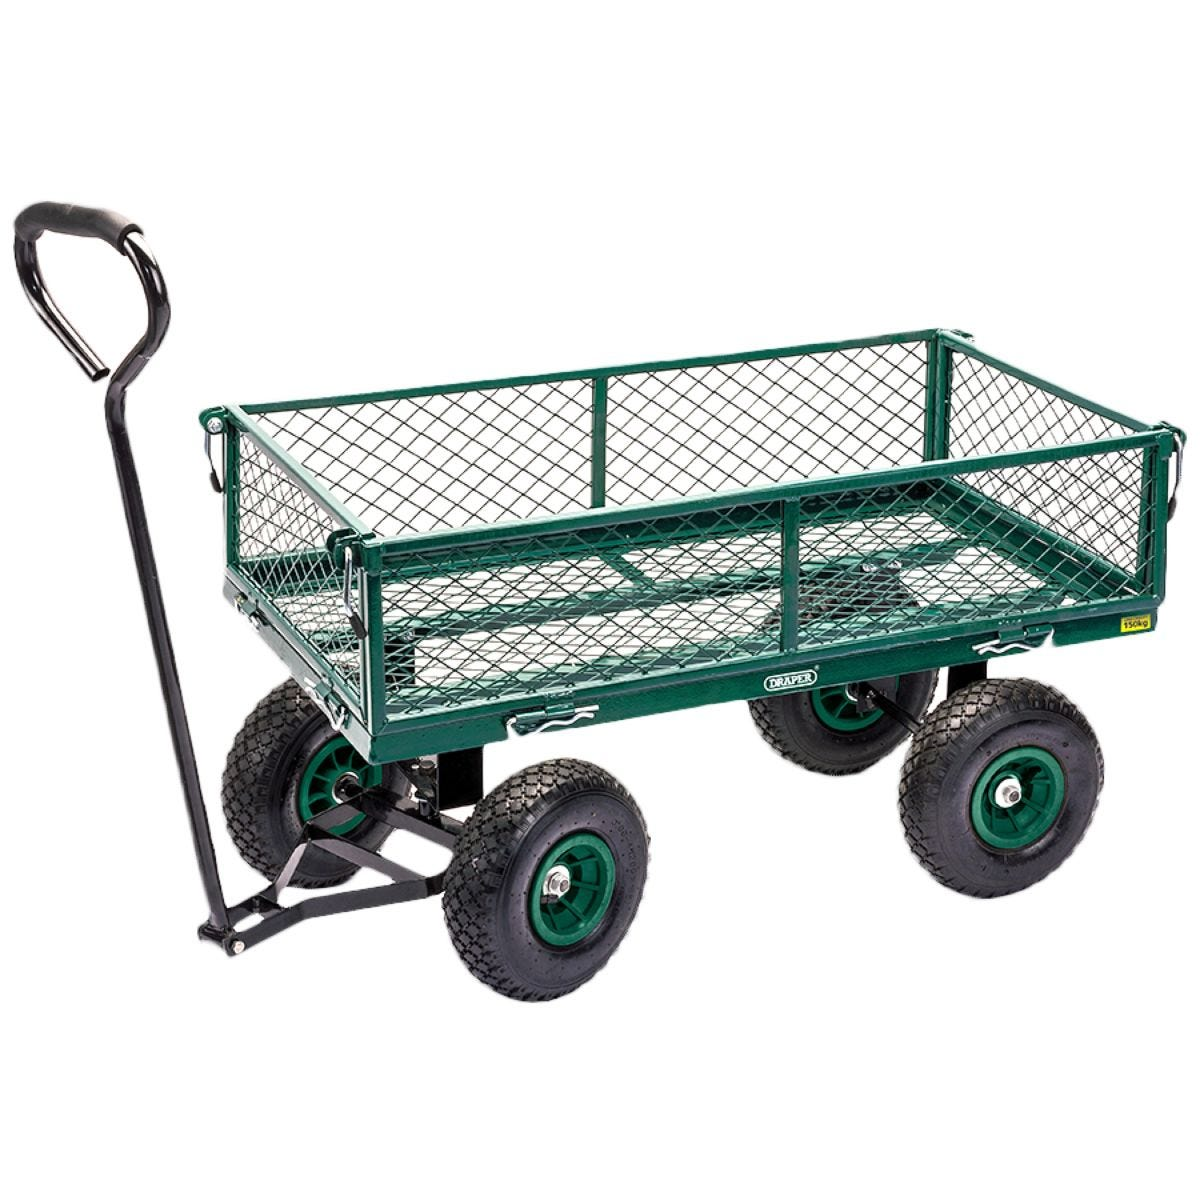 Draper Steel Mesh Garden Cart with Pneumatic Wheels